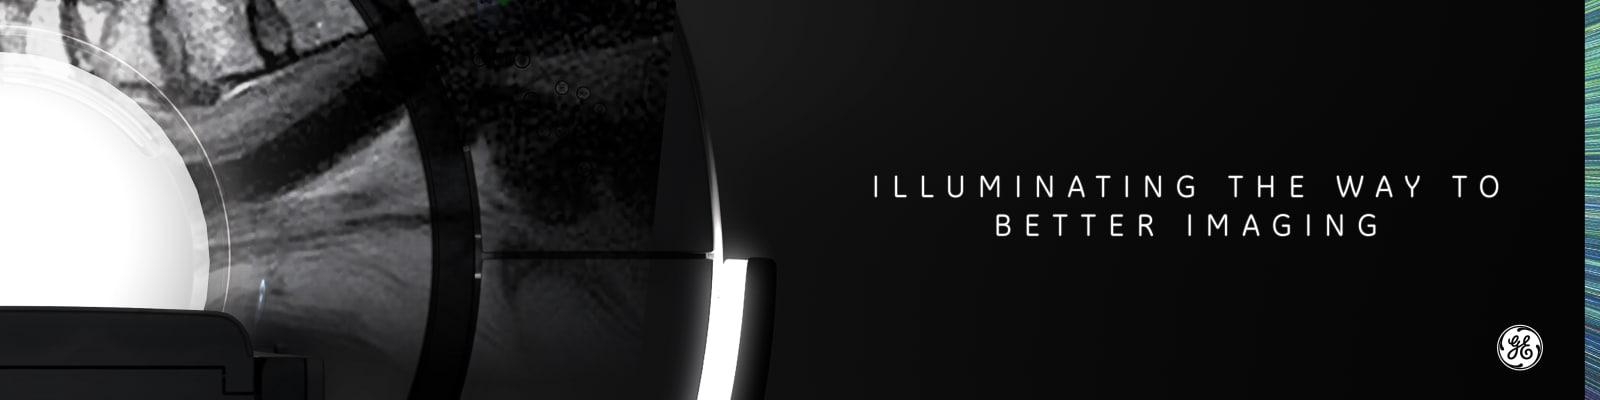 GE Signa Pioneer Illumination Banner 2